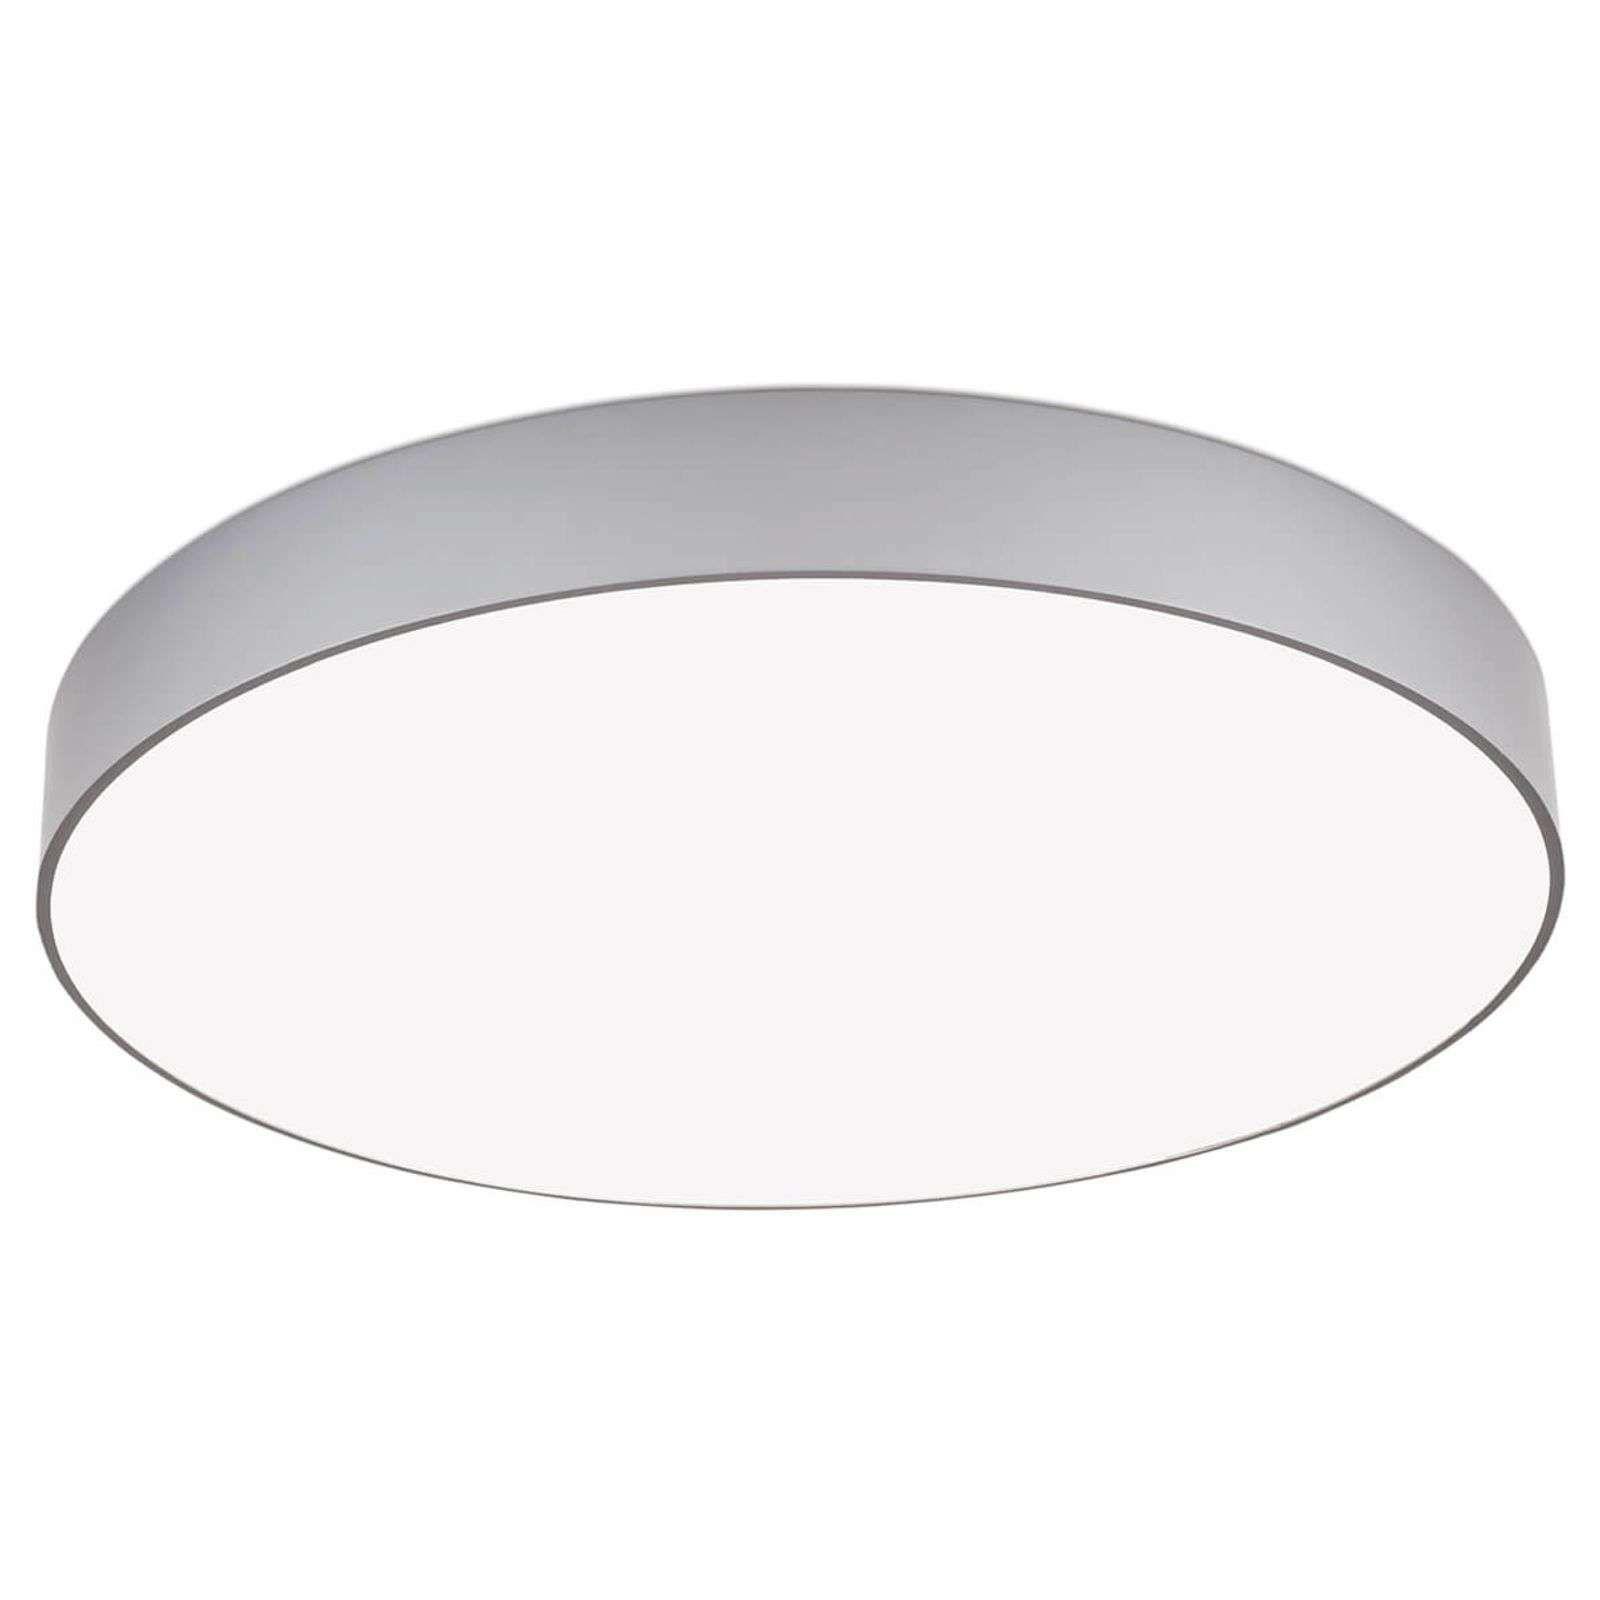 Dimbare Led Plafondlamp Egilo 60 Cm Plafondlamp Led Binnenverlichting